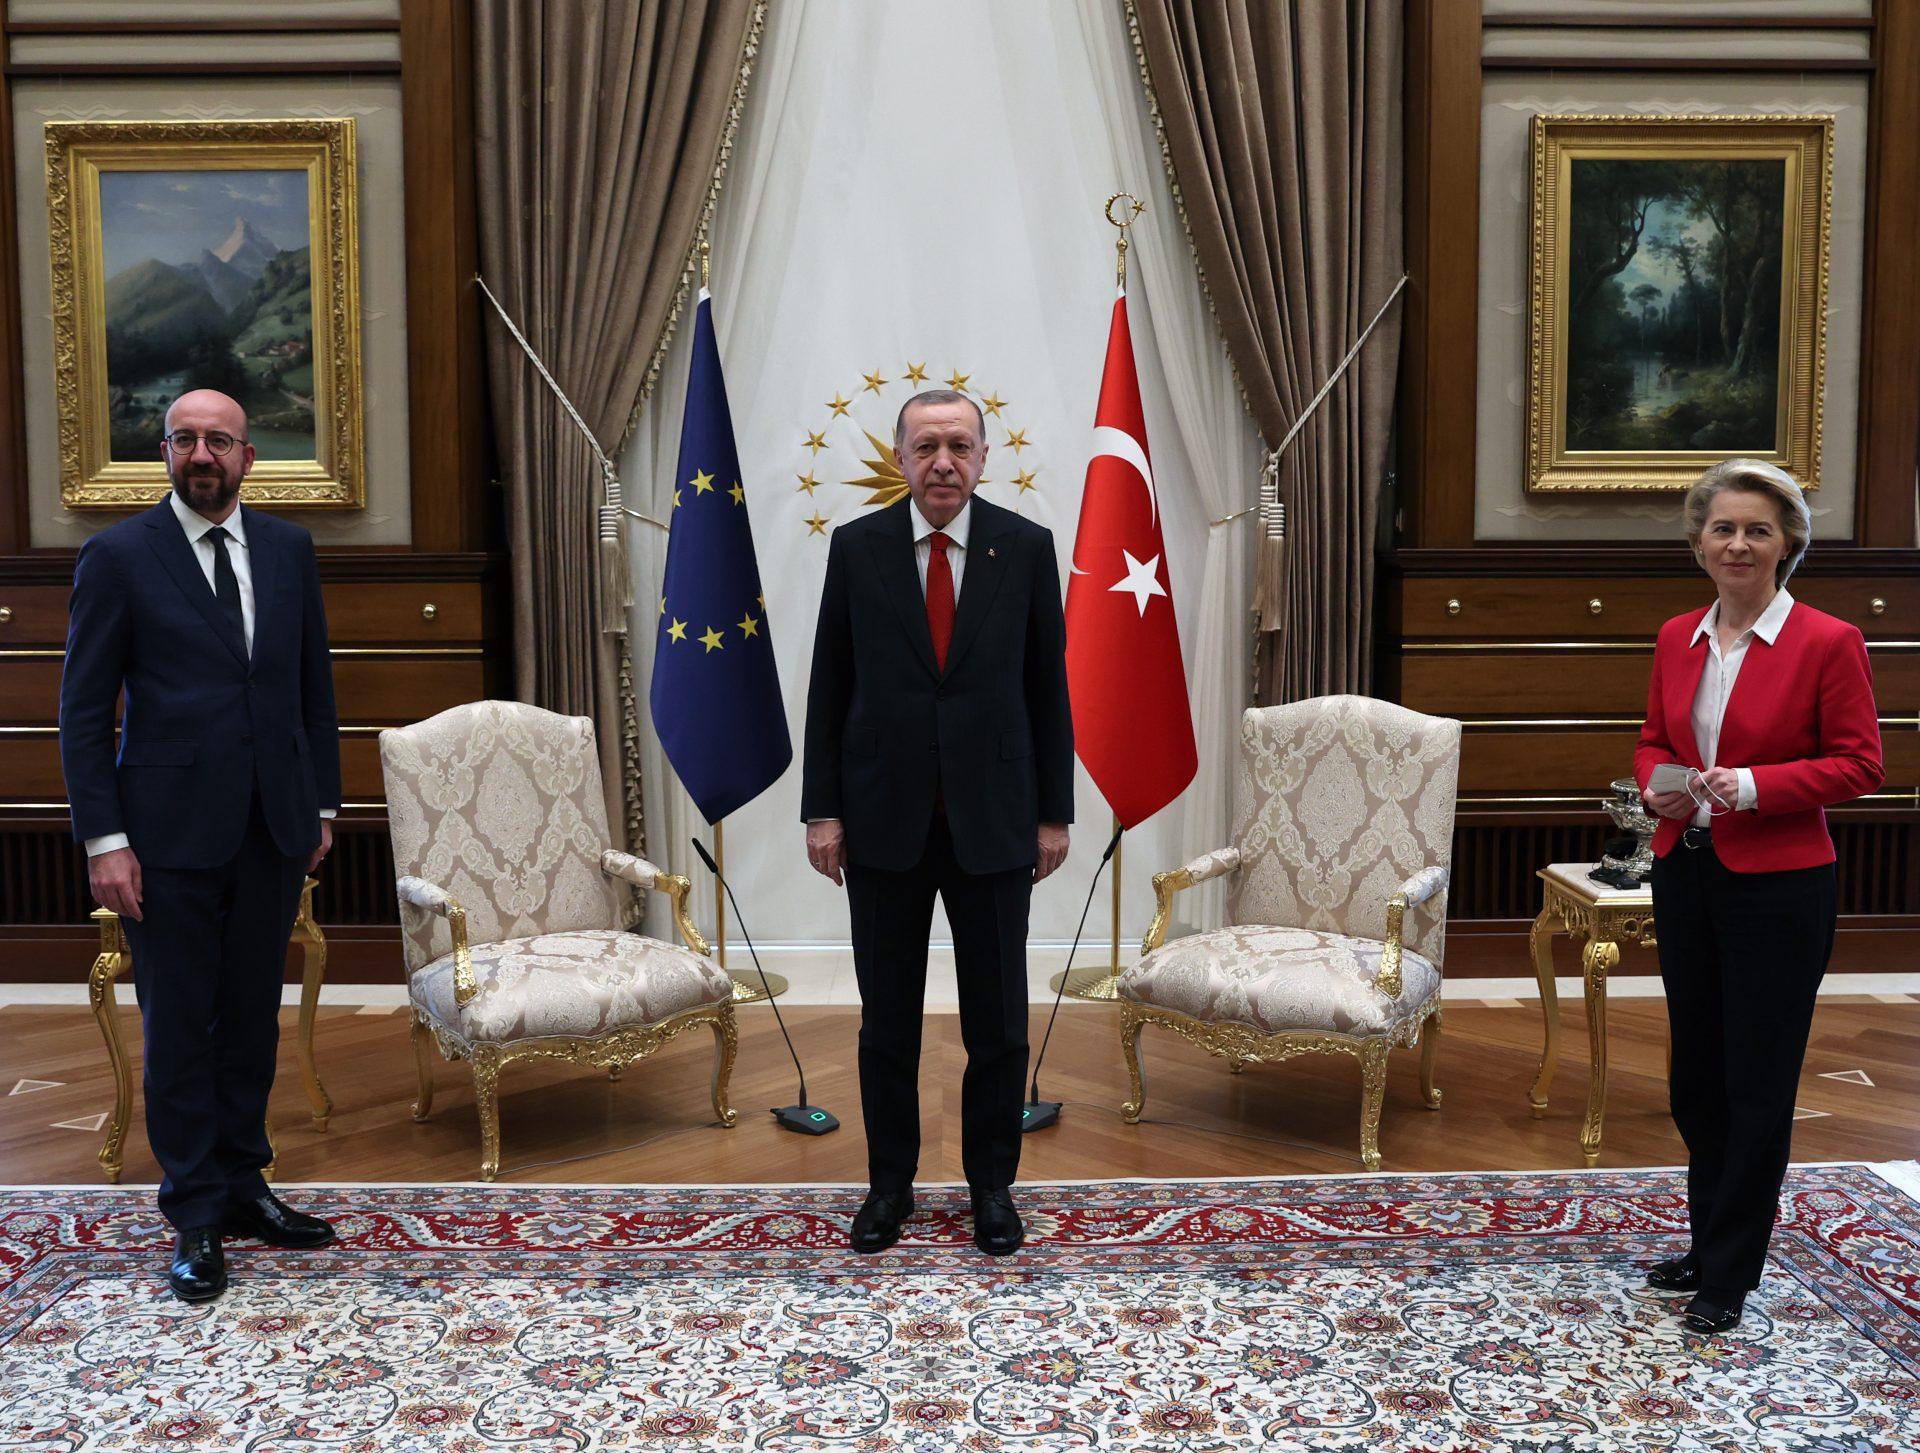 Sarl Misel, Redzep Tajip Erdogan i Ursula fon der Lejen